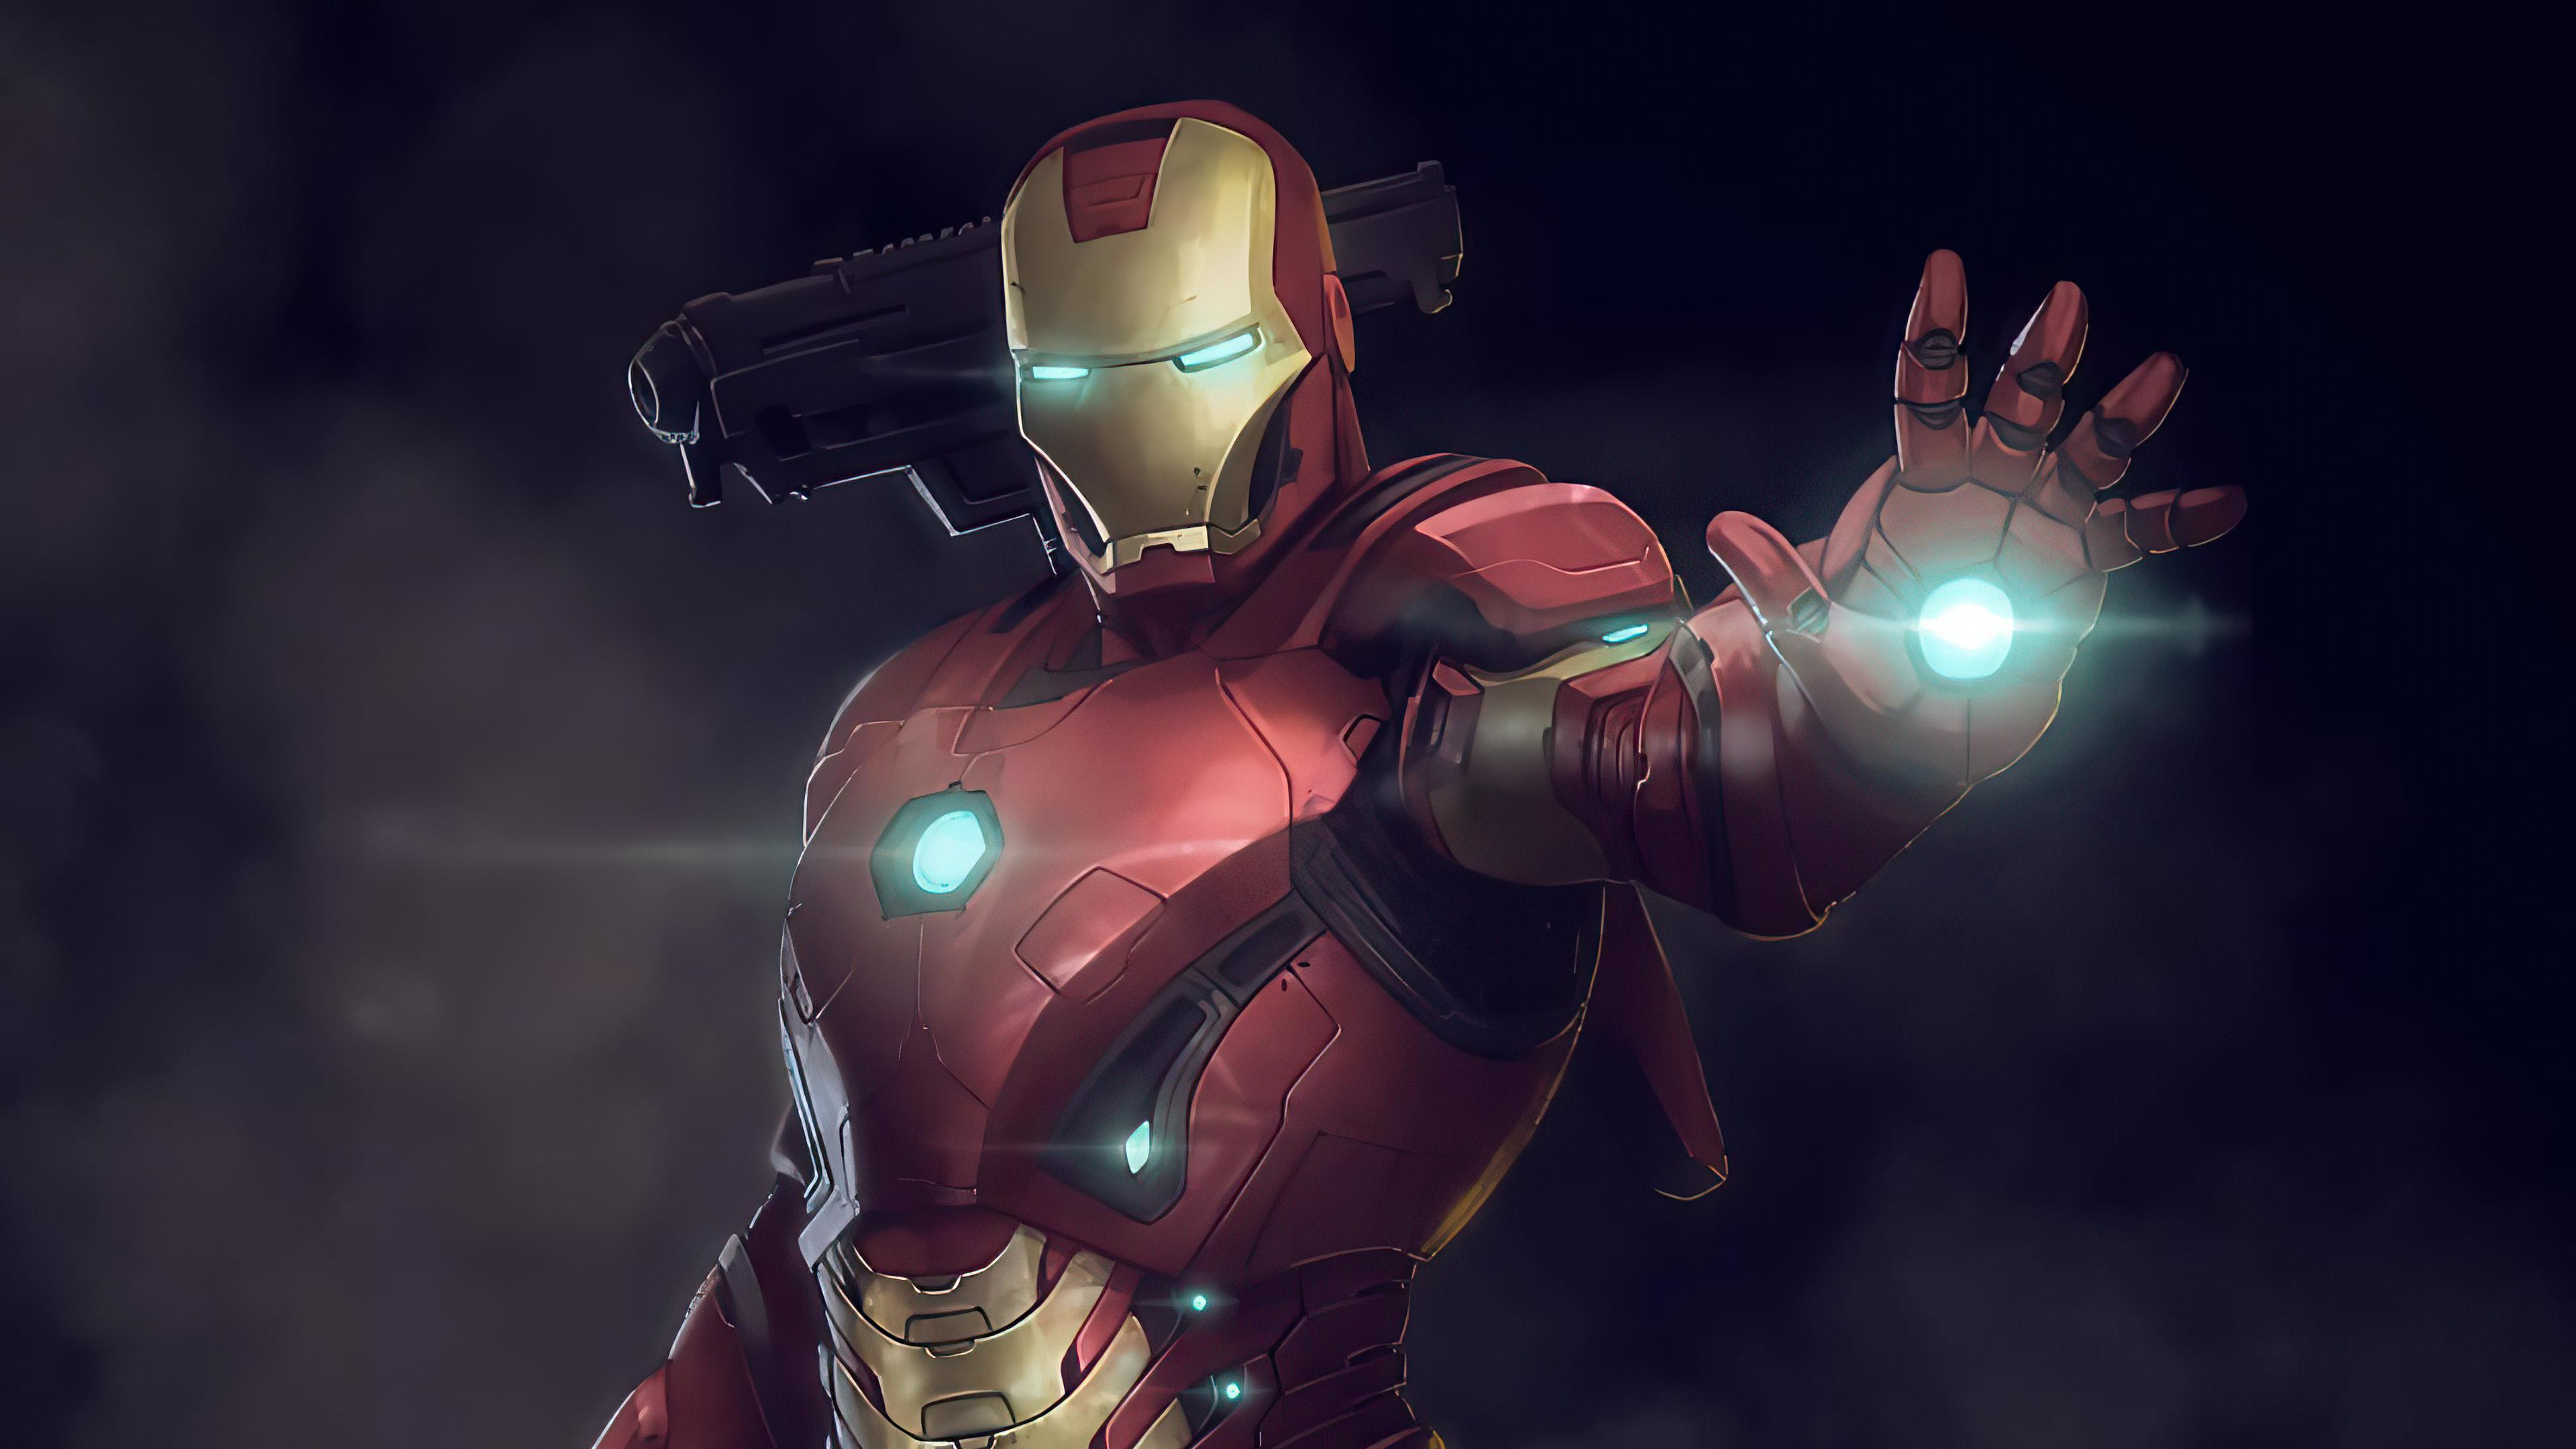 Iron Man 4k Ultra Fond d'écran HD | Arrière-Plan | 3840x2160 | ID:1090983 - Wallpaper Abyss